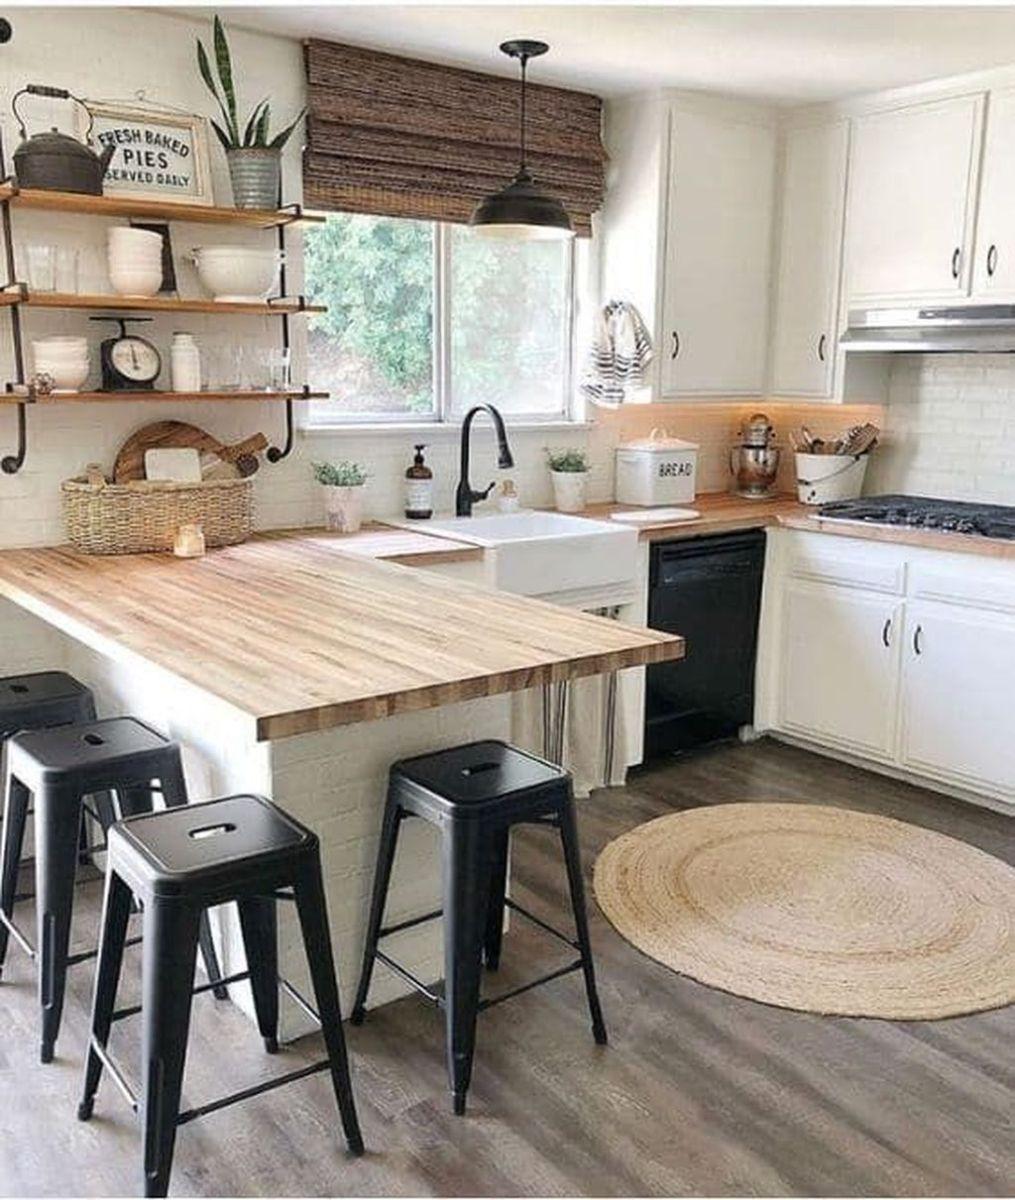 Stunning Rustic Kitchen Design And Decor Ideas 19